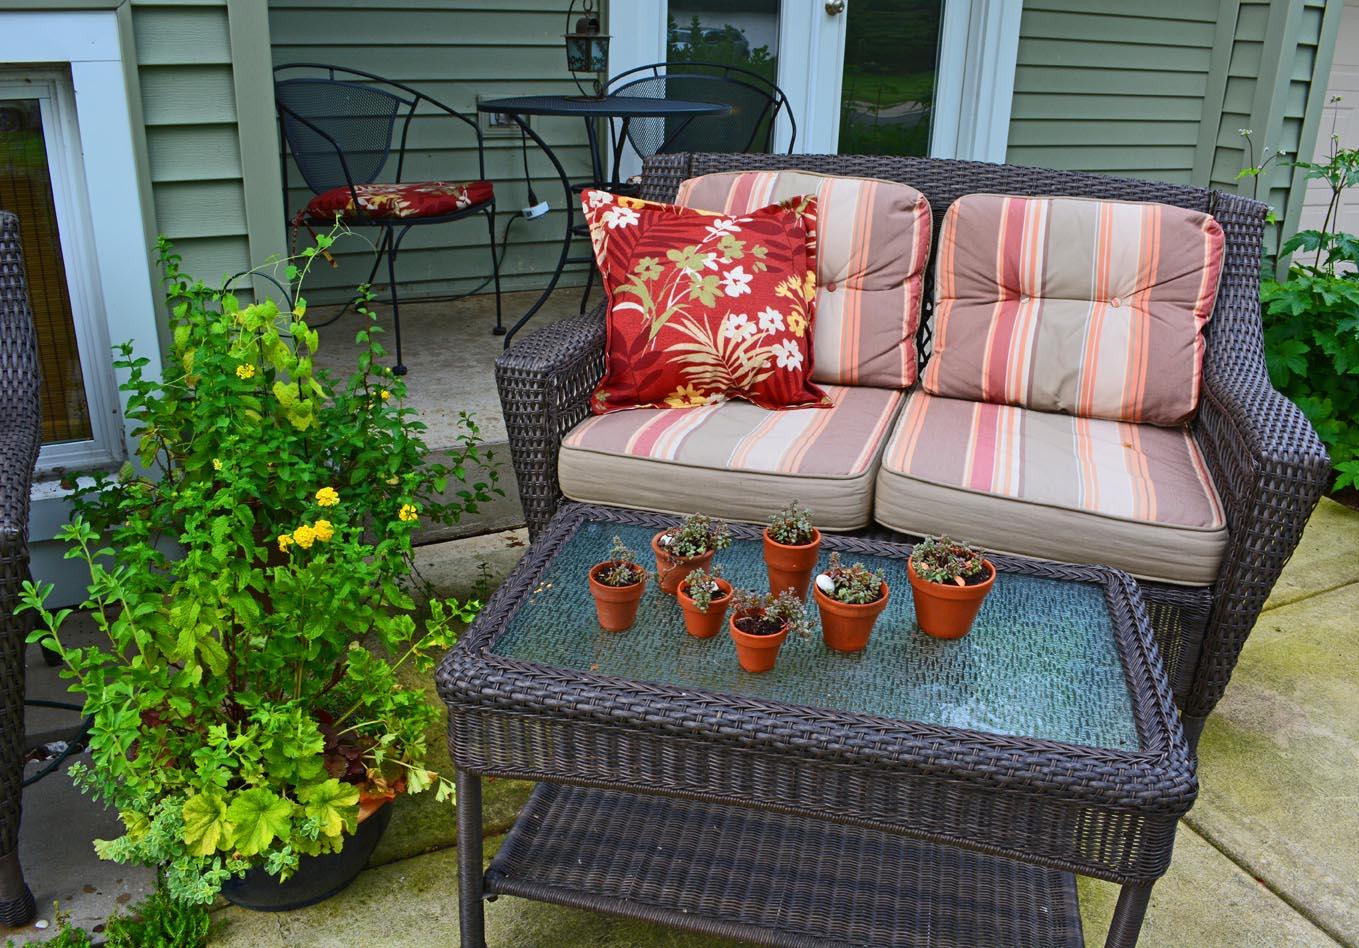 Grow Herb Garden on Patio